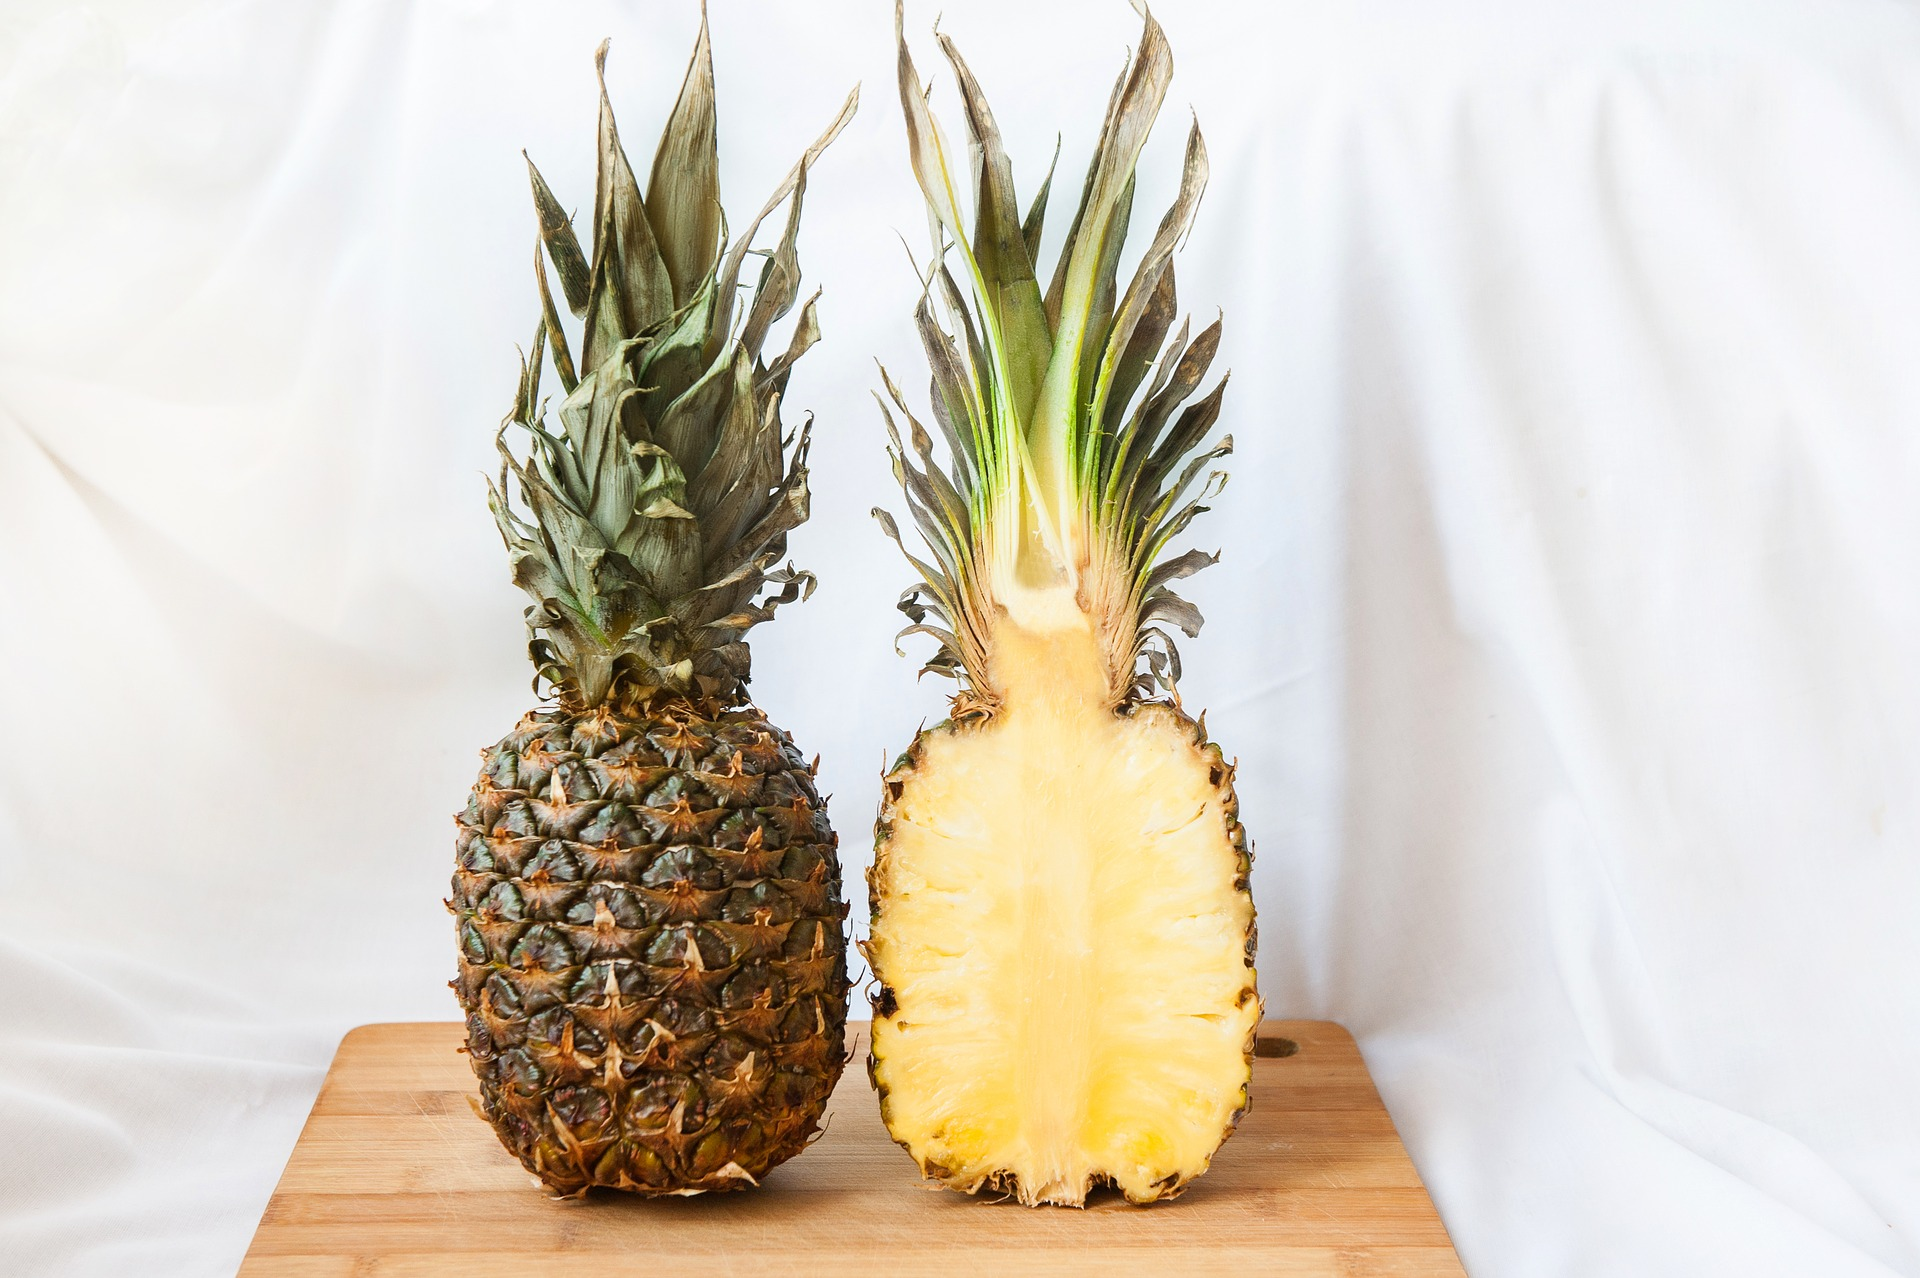 pineapple-3720930_1920